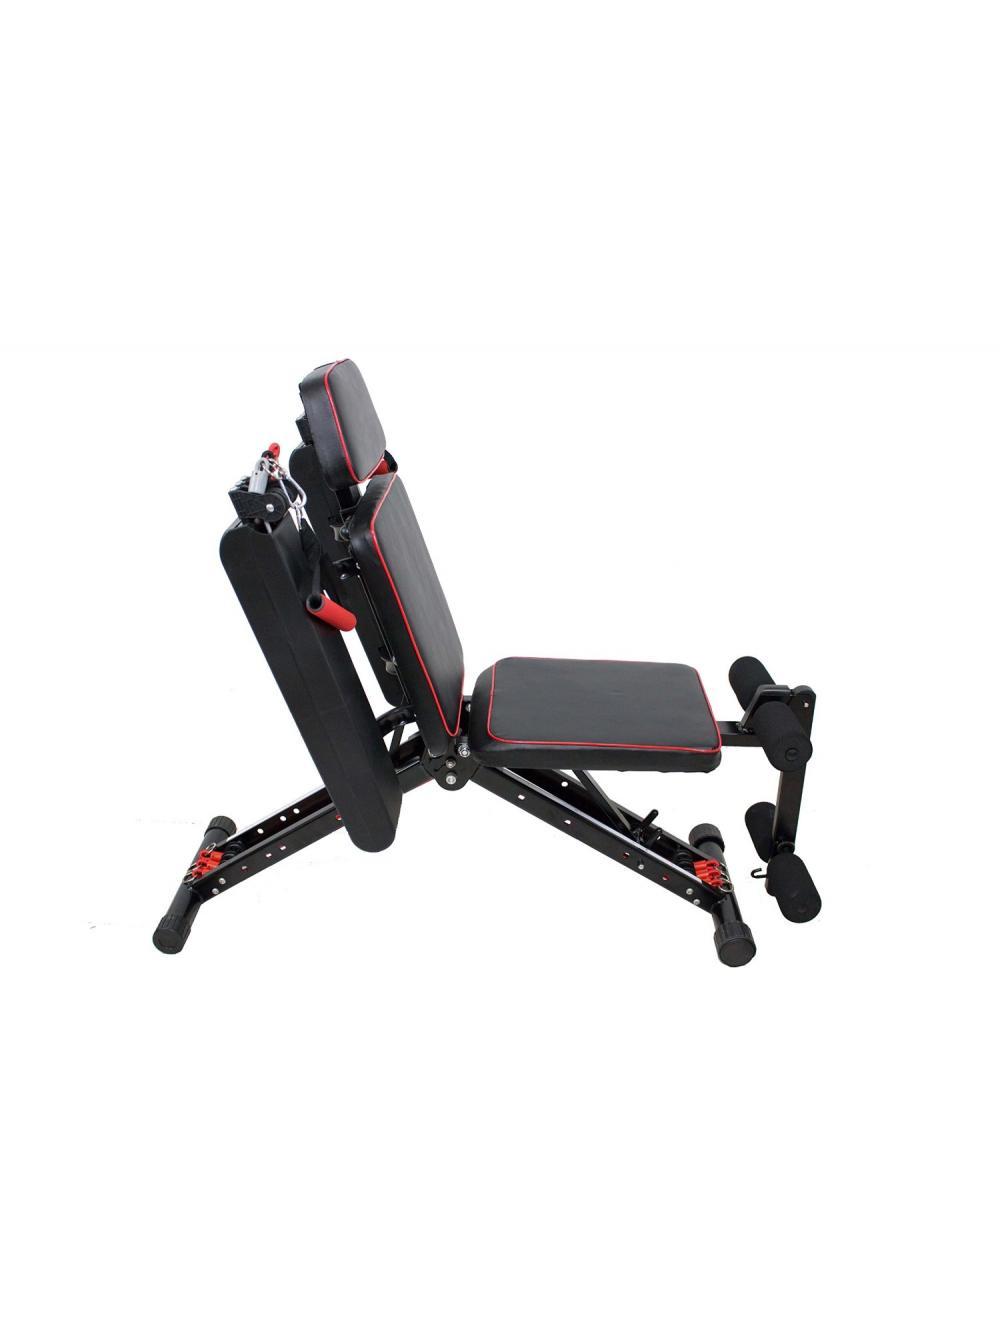 Fitnessgerät - Hometrainer